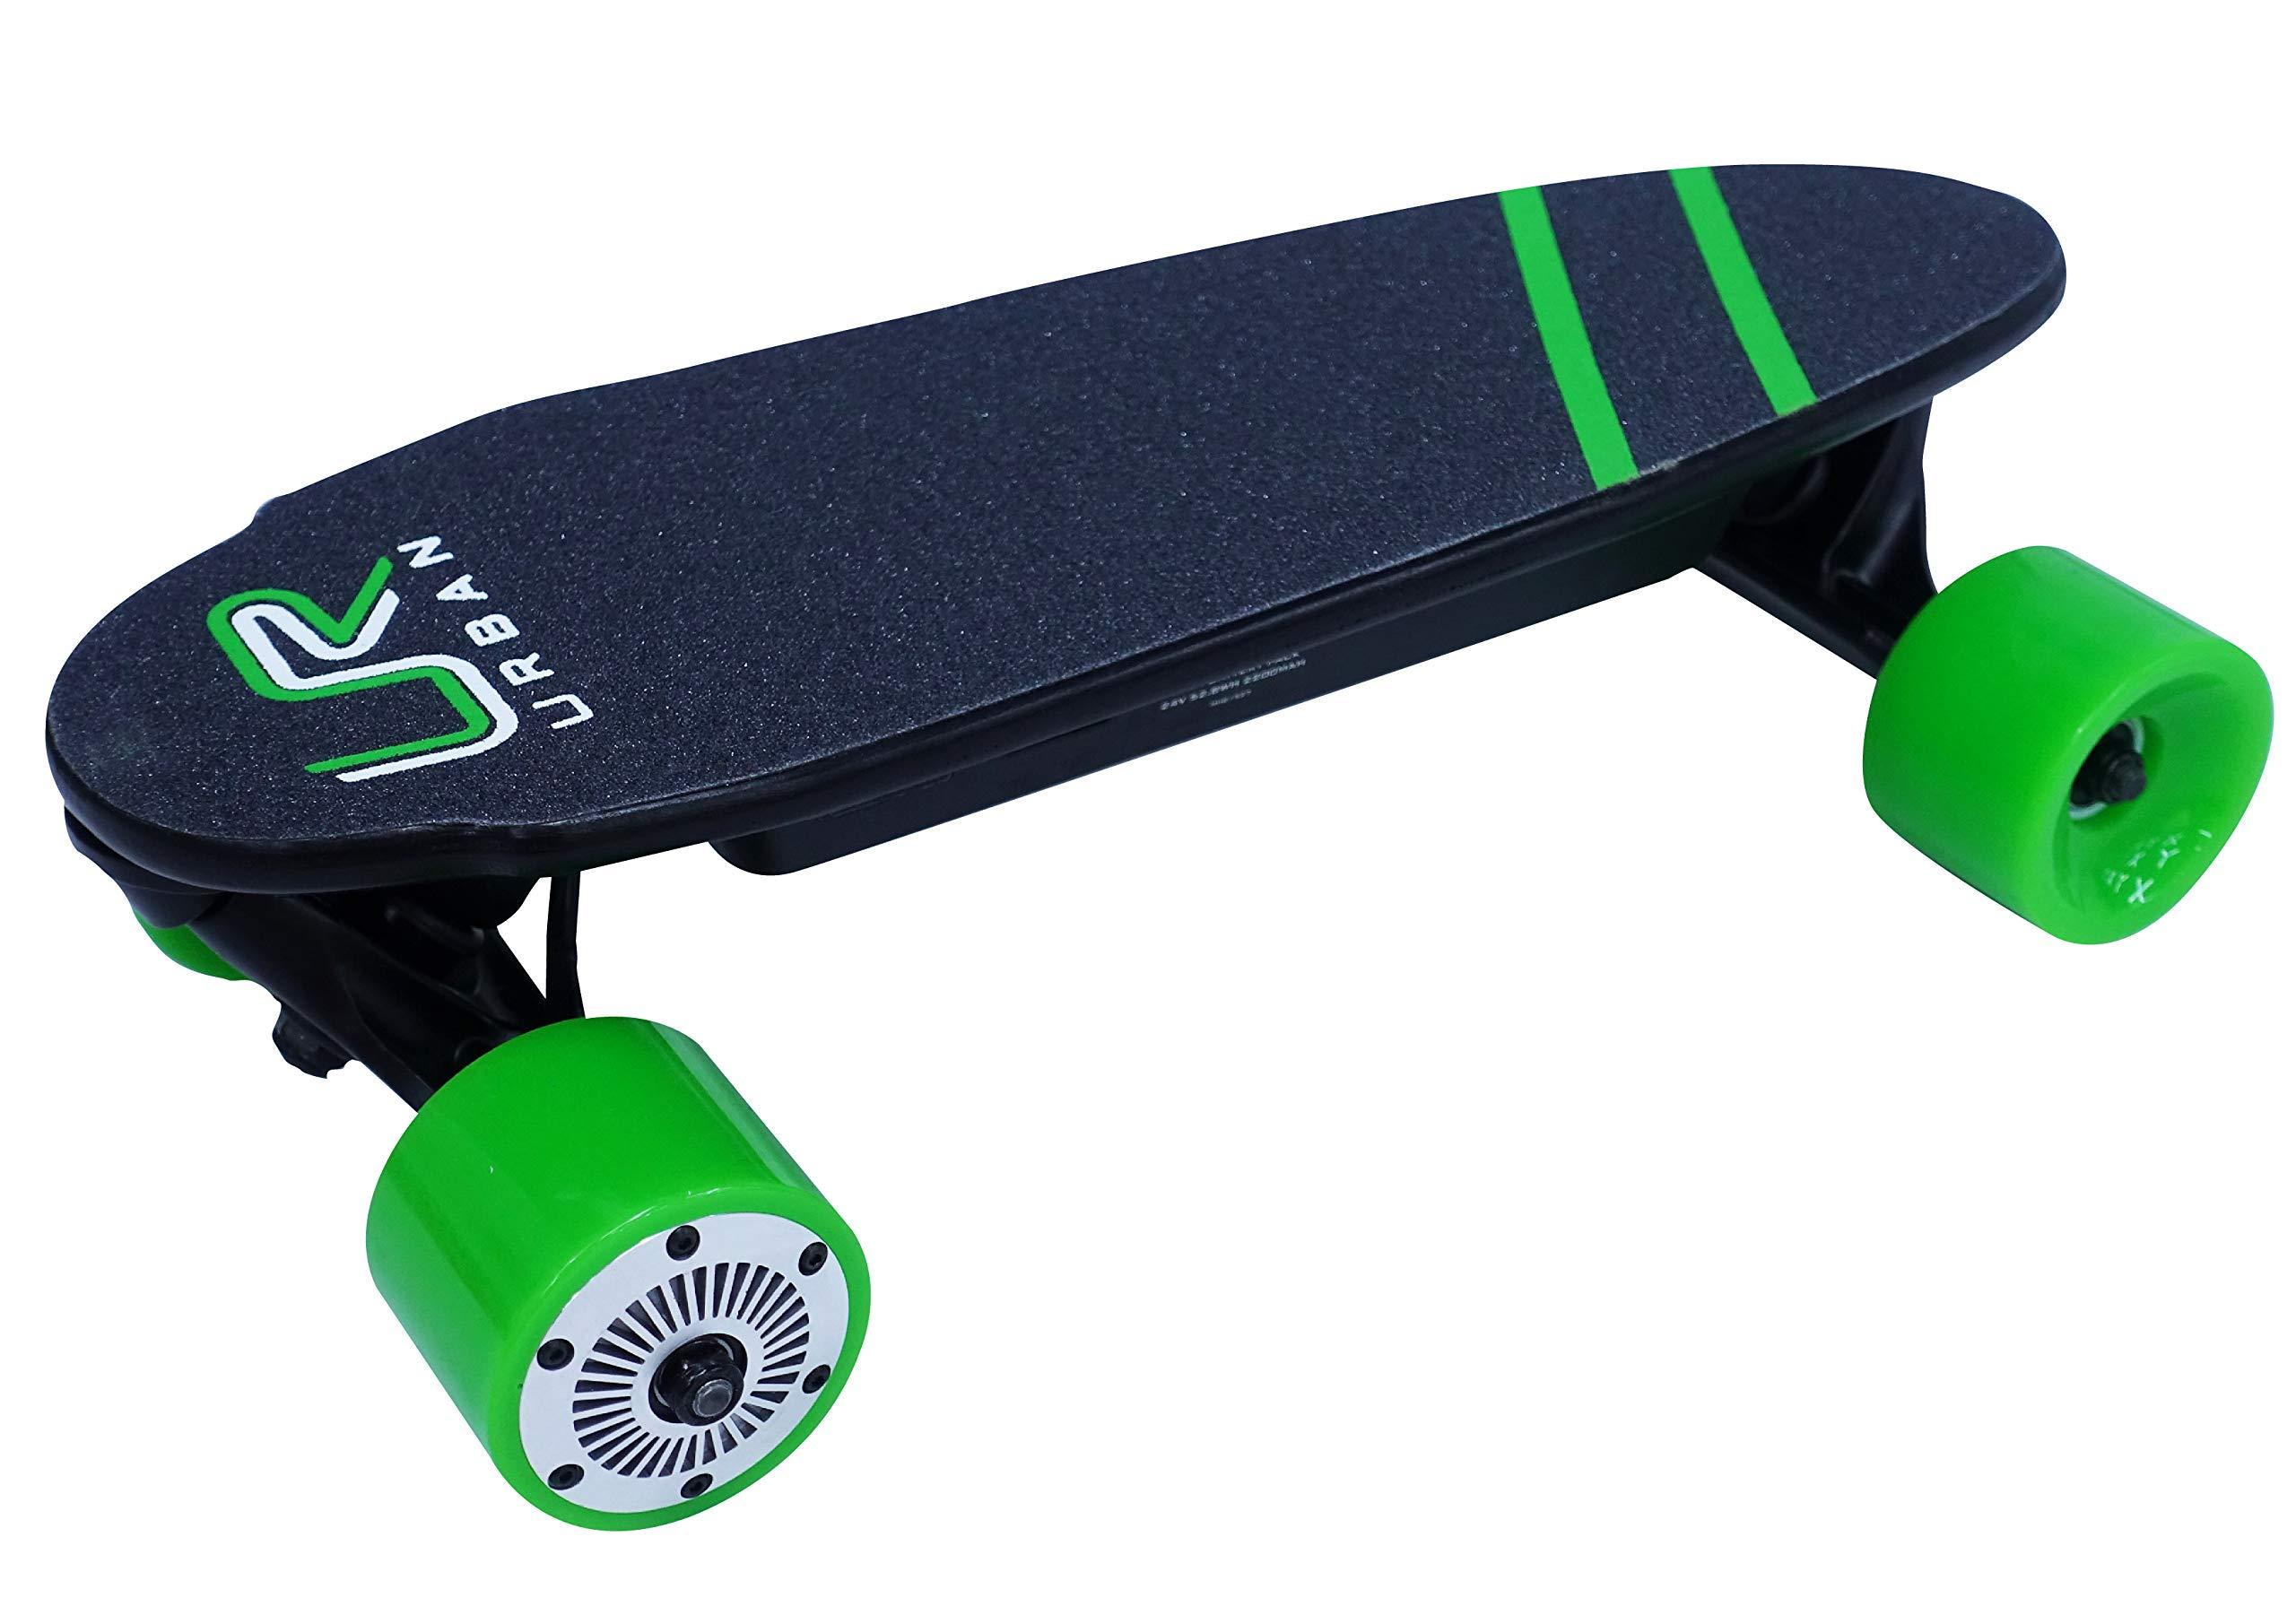 Urban - Portable Mini Electric Skateboard Skateboard with Wireless Remote 17 Inch 12 MPH 7 Mile Range (Green) by Urban (Image #1)